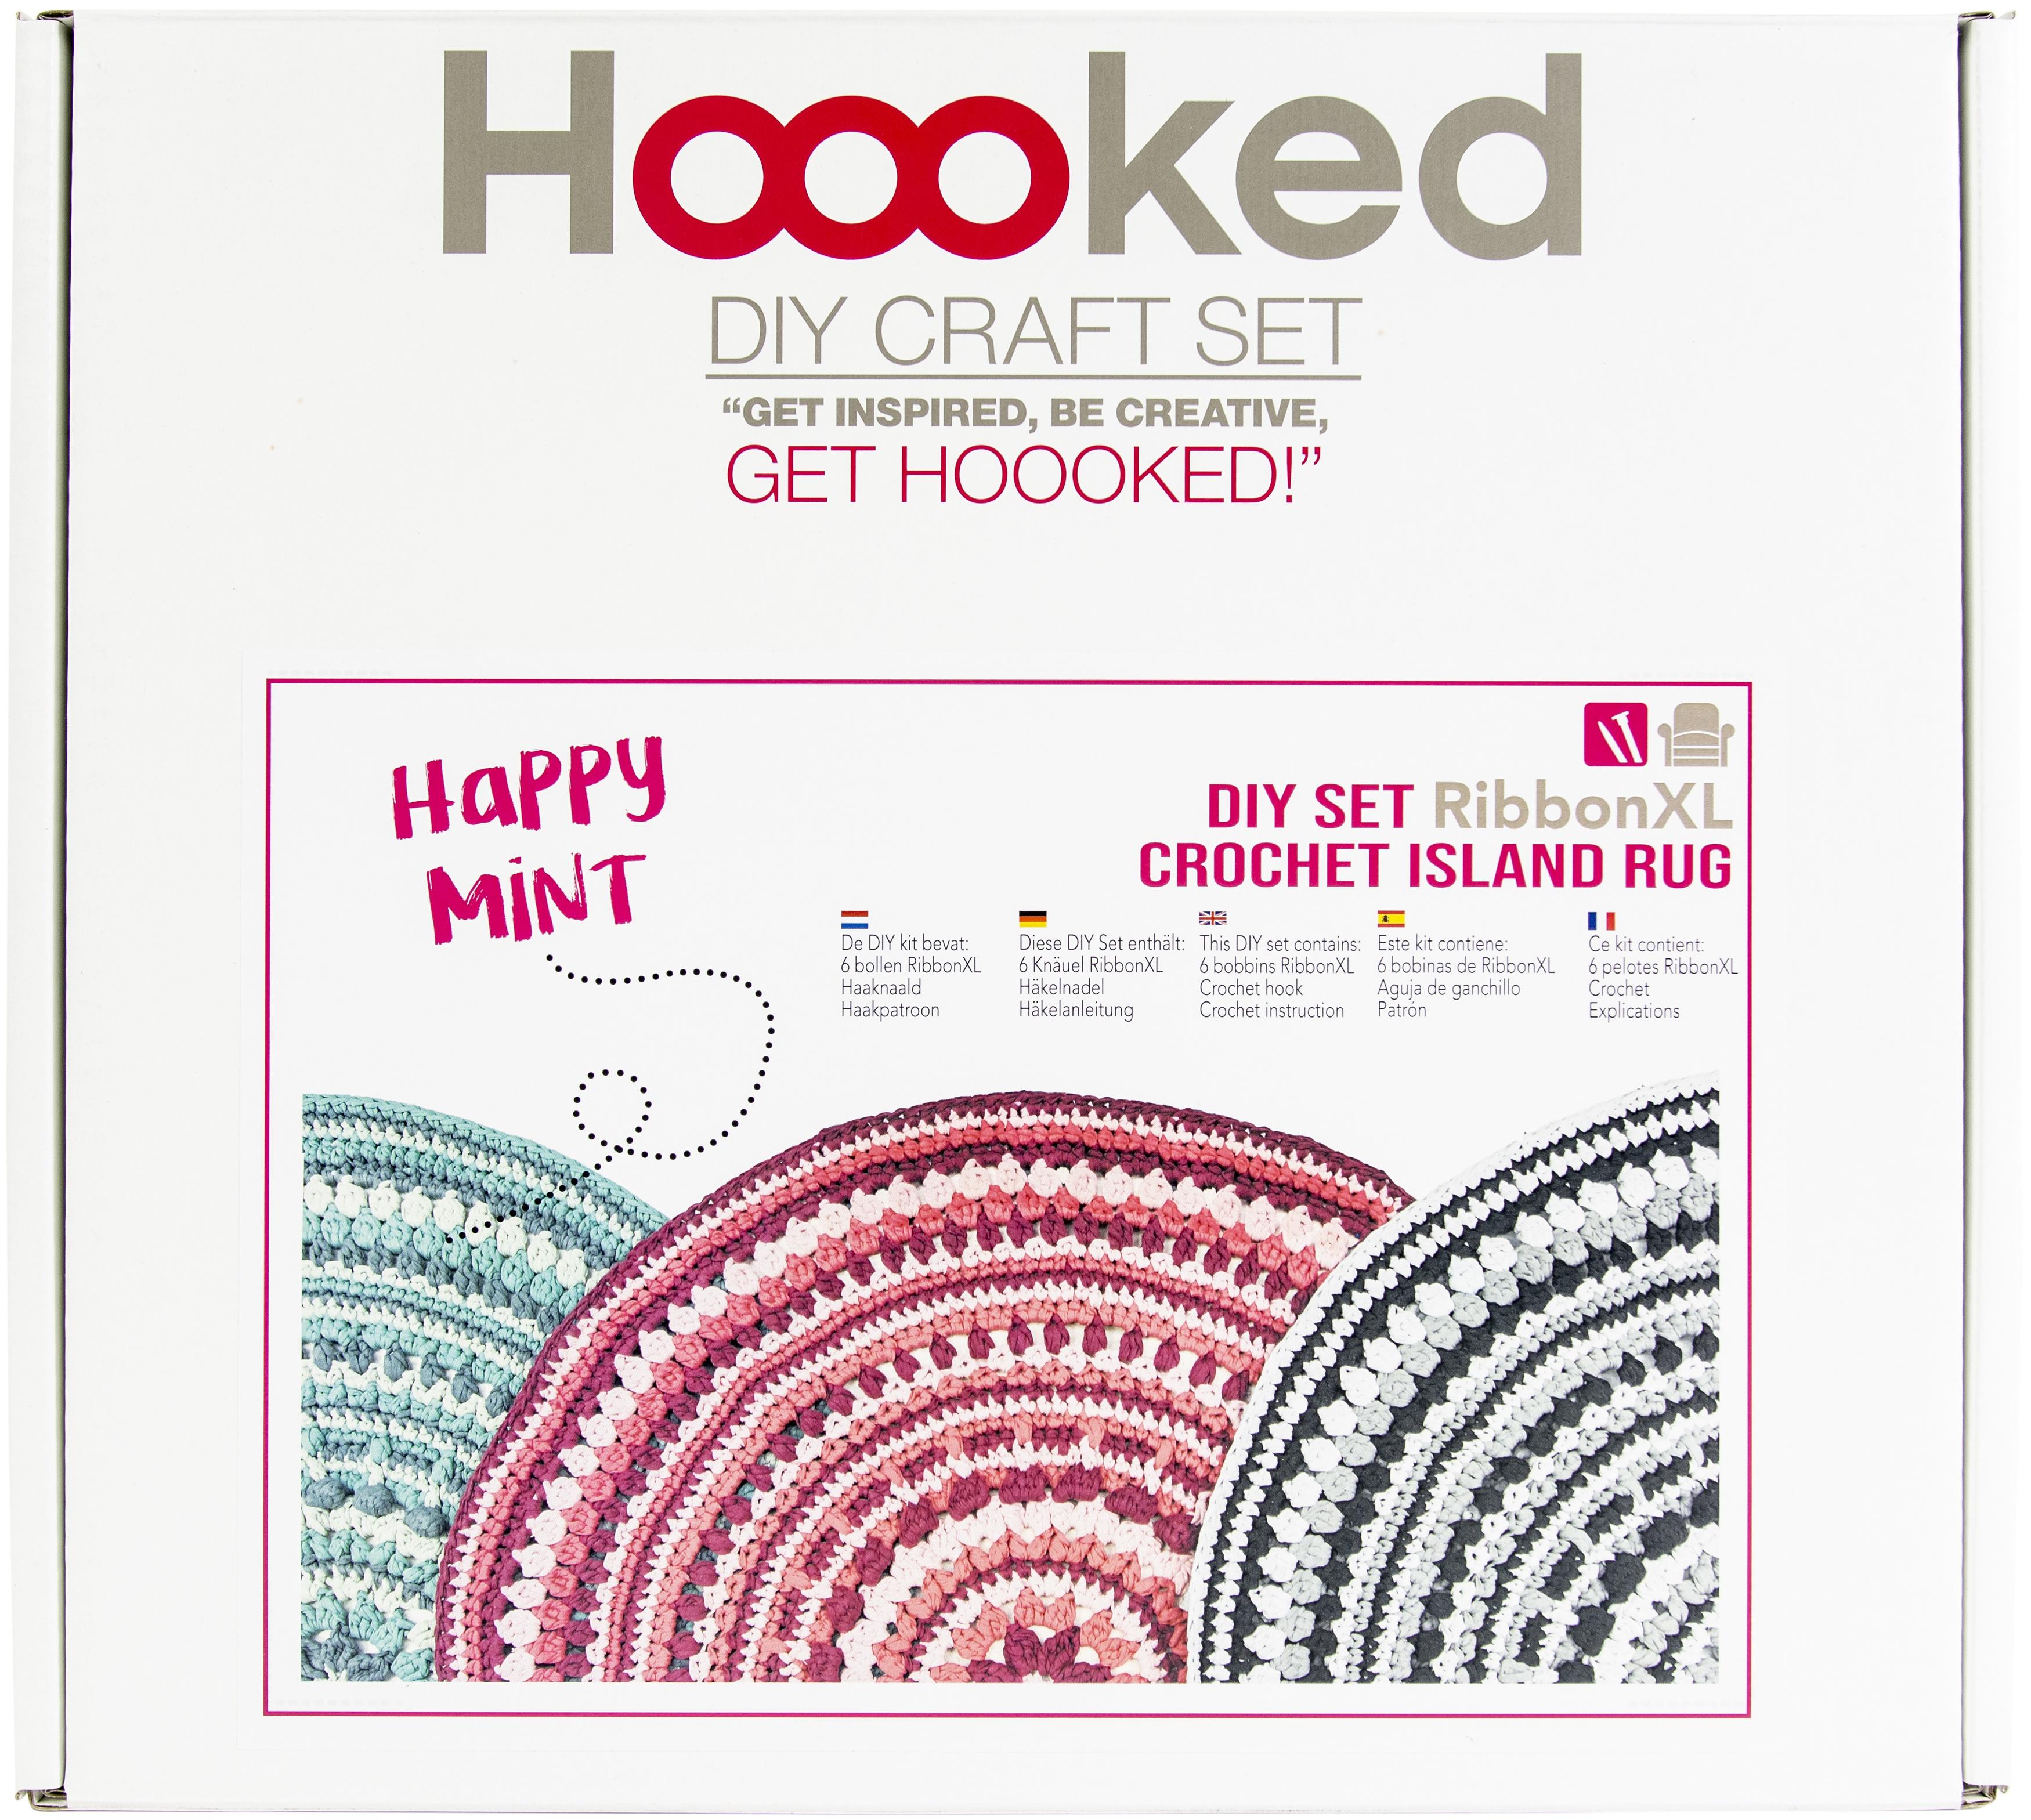 Hoooked Crochet Island Rug Kit W/RibbonXL-Happy Mint